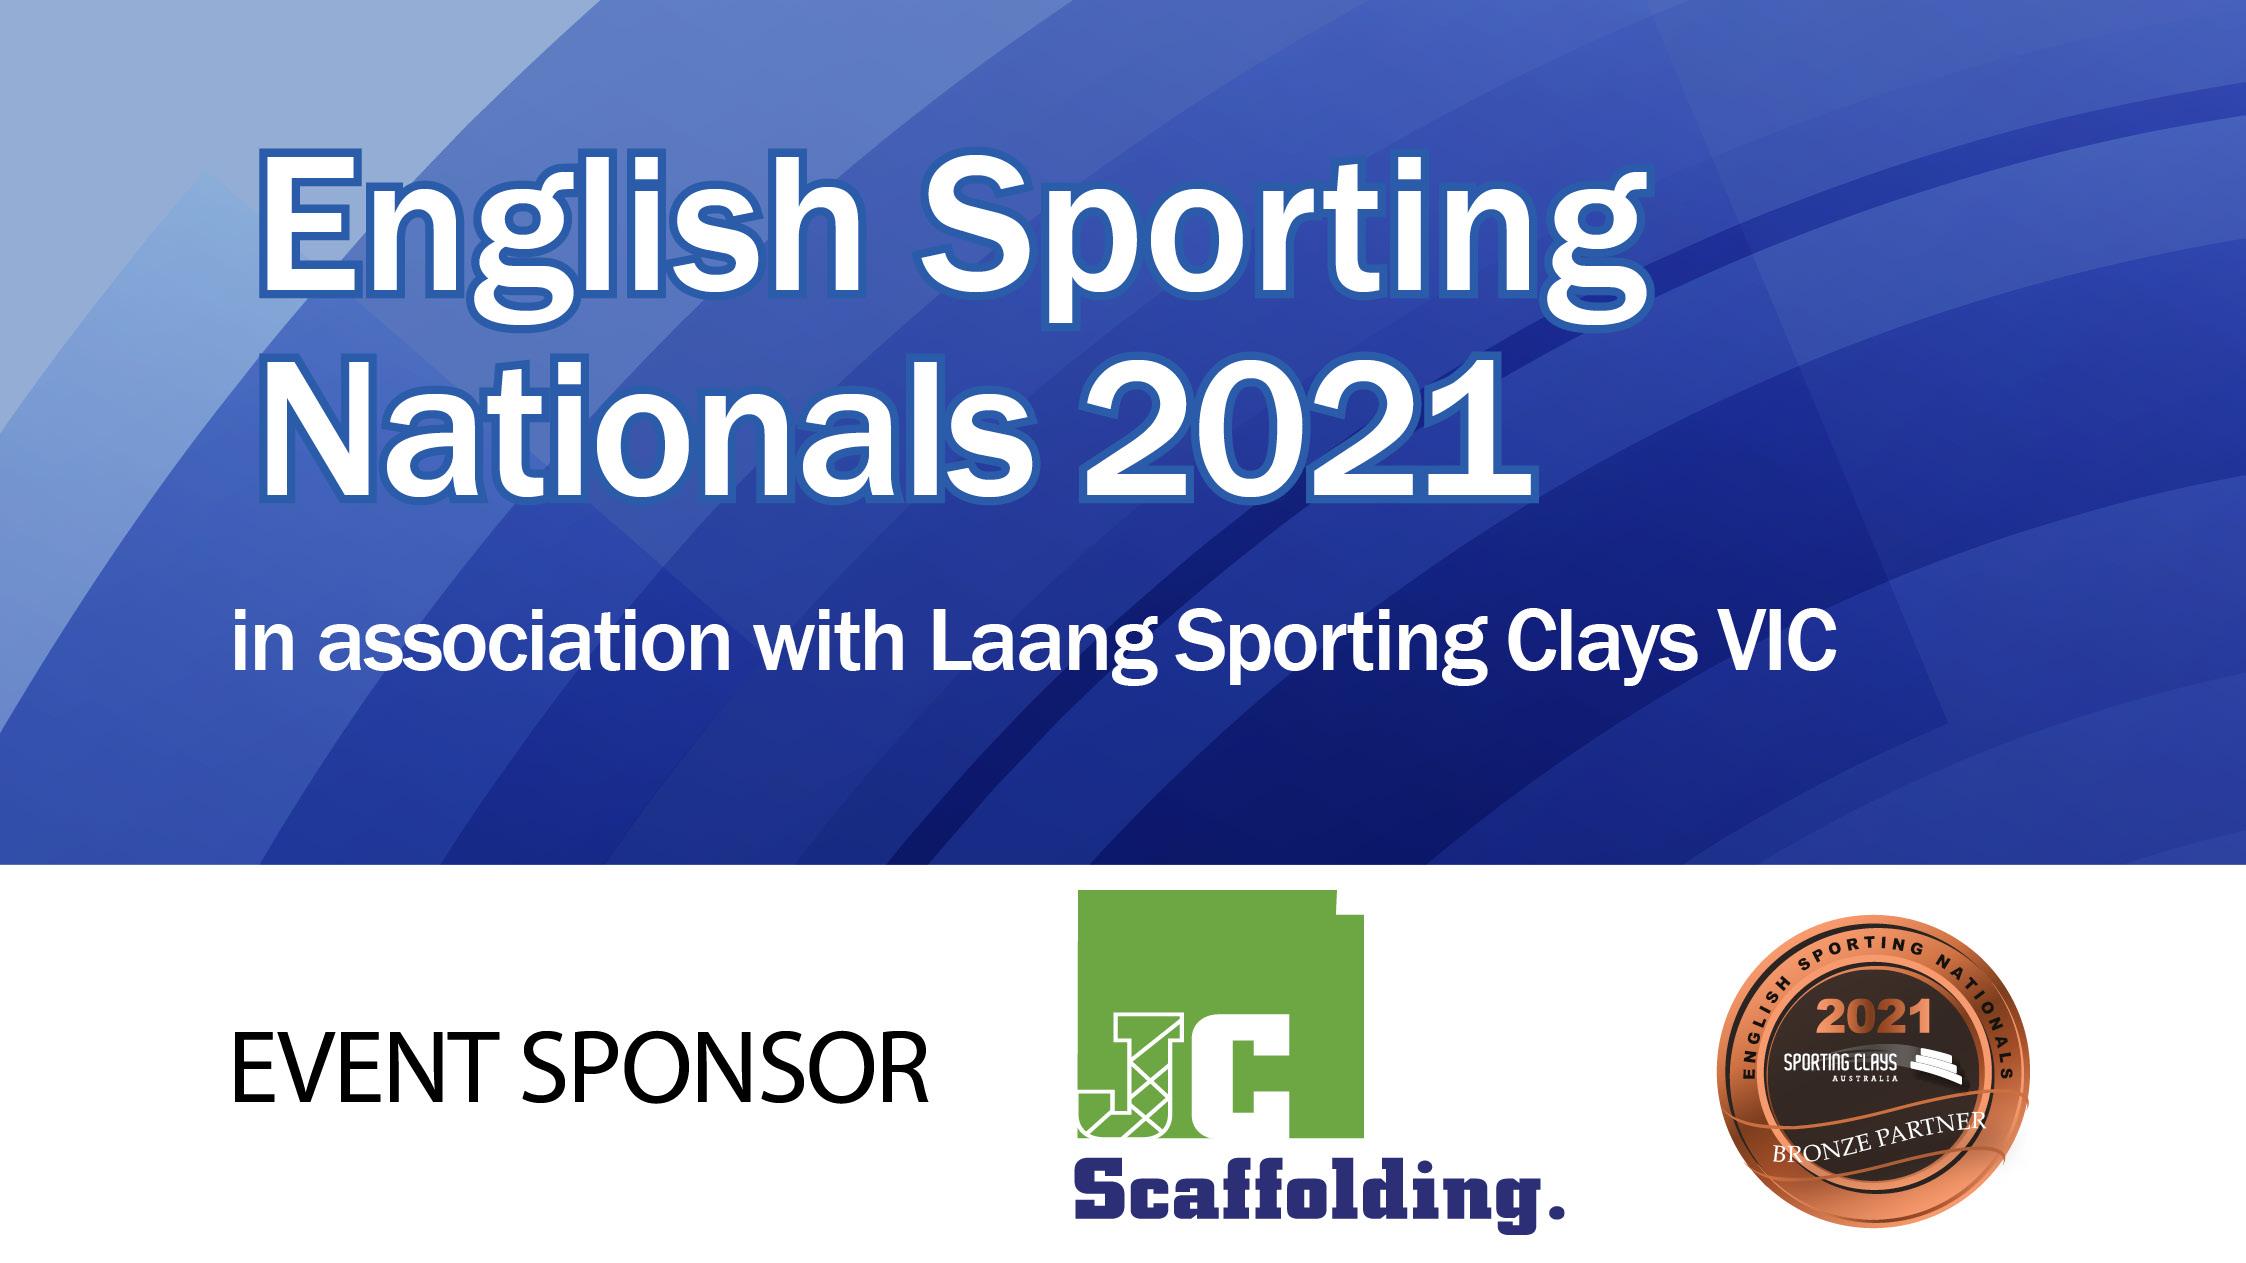 2021-english-sporting-nationals-jc-scaffolding